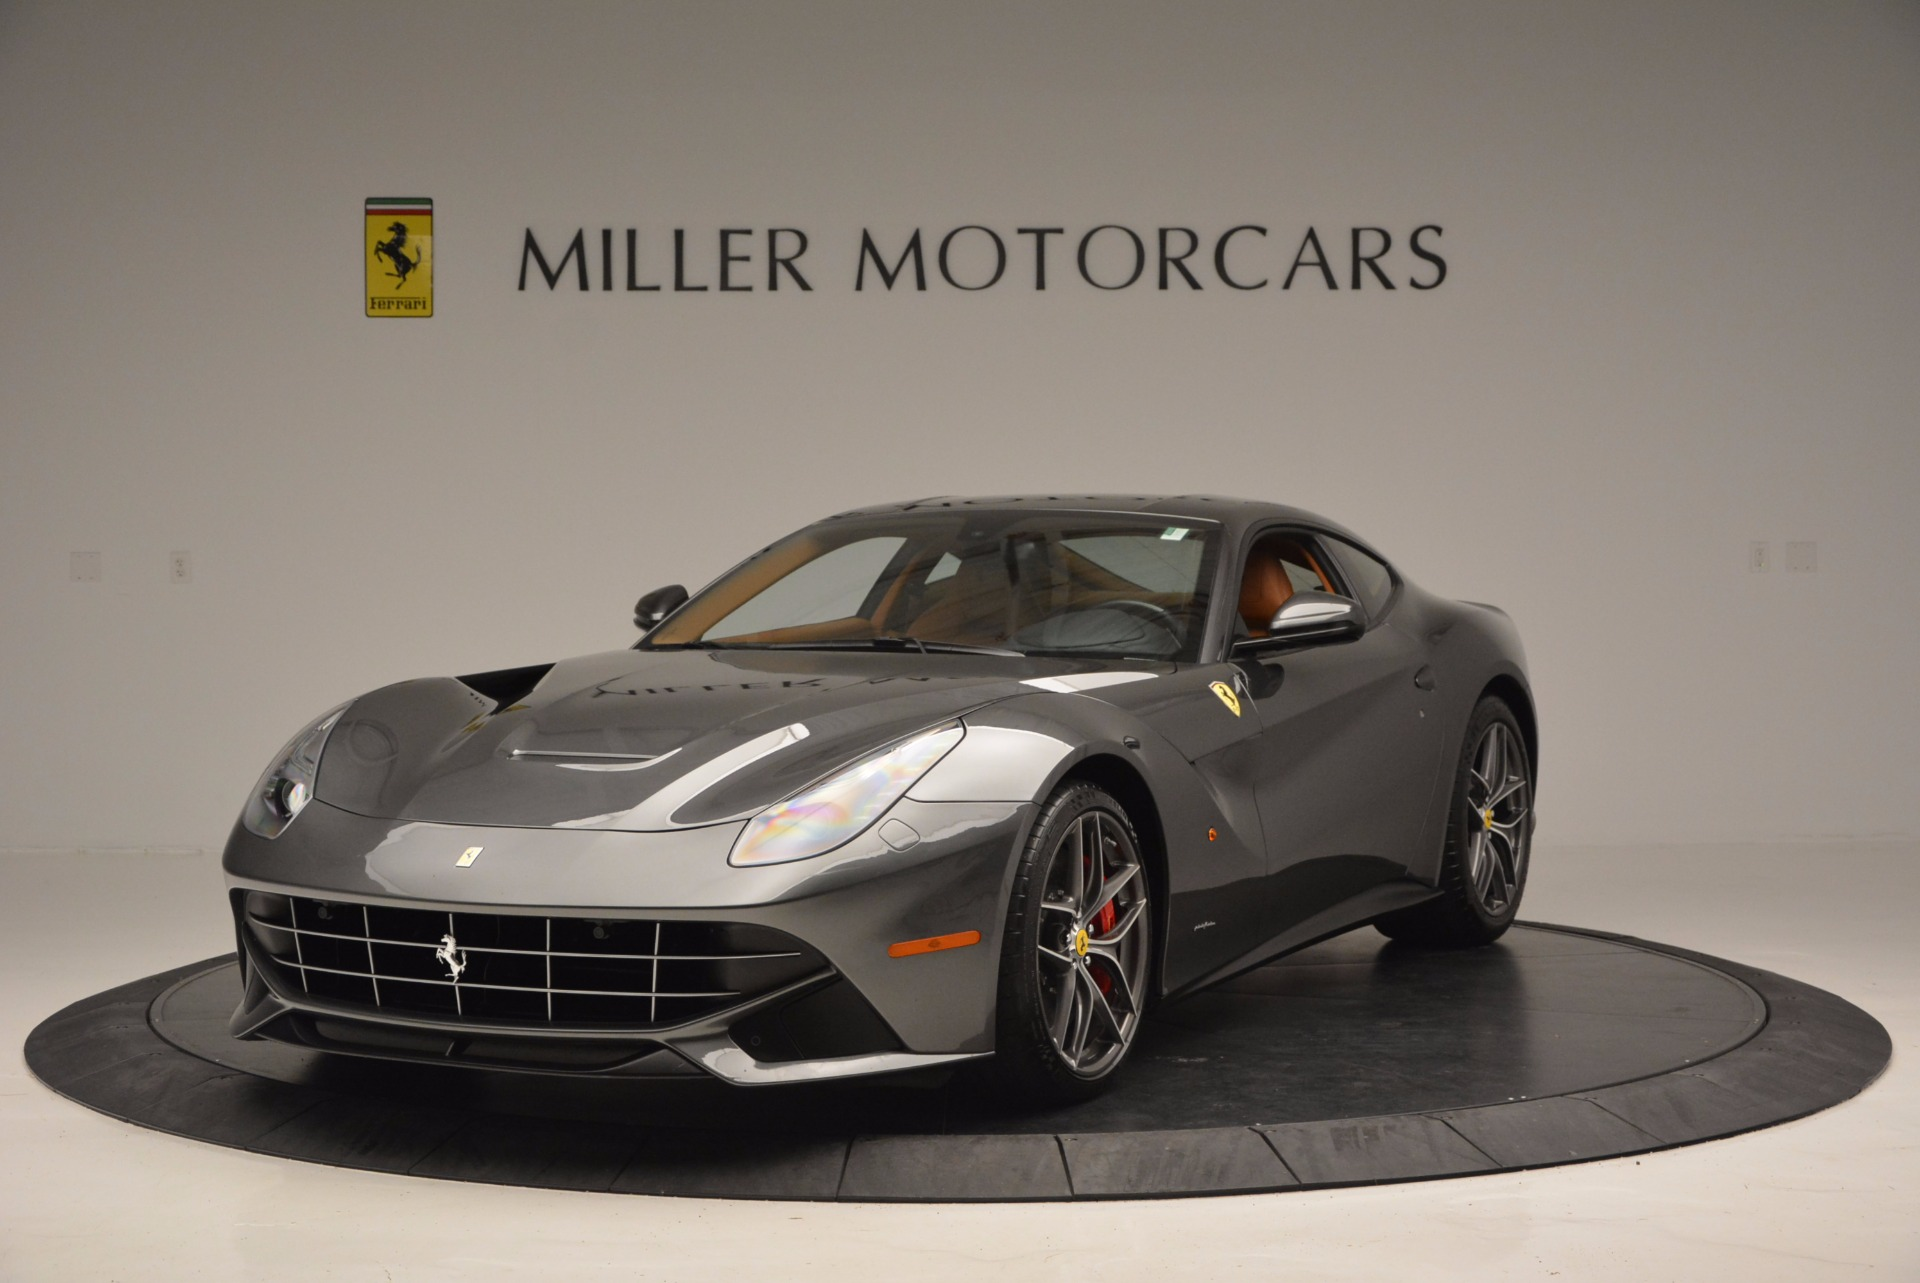 Used 2014 Ferrari F12 Berlinetta for sale Sold at Rolls-Royce Motor Cars Greenwich in Greenwich CT 06830 1